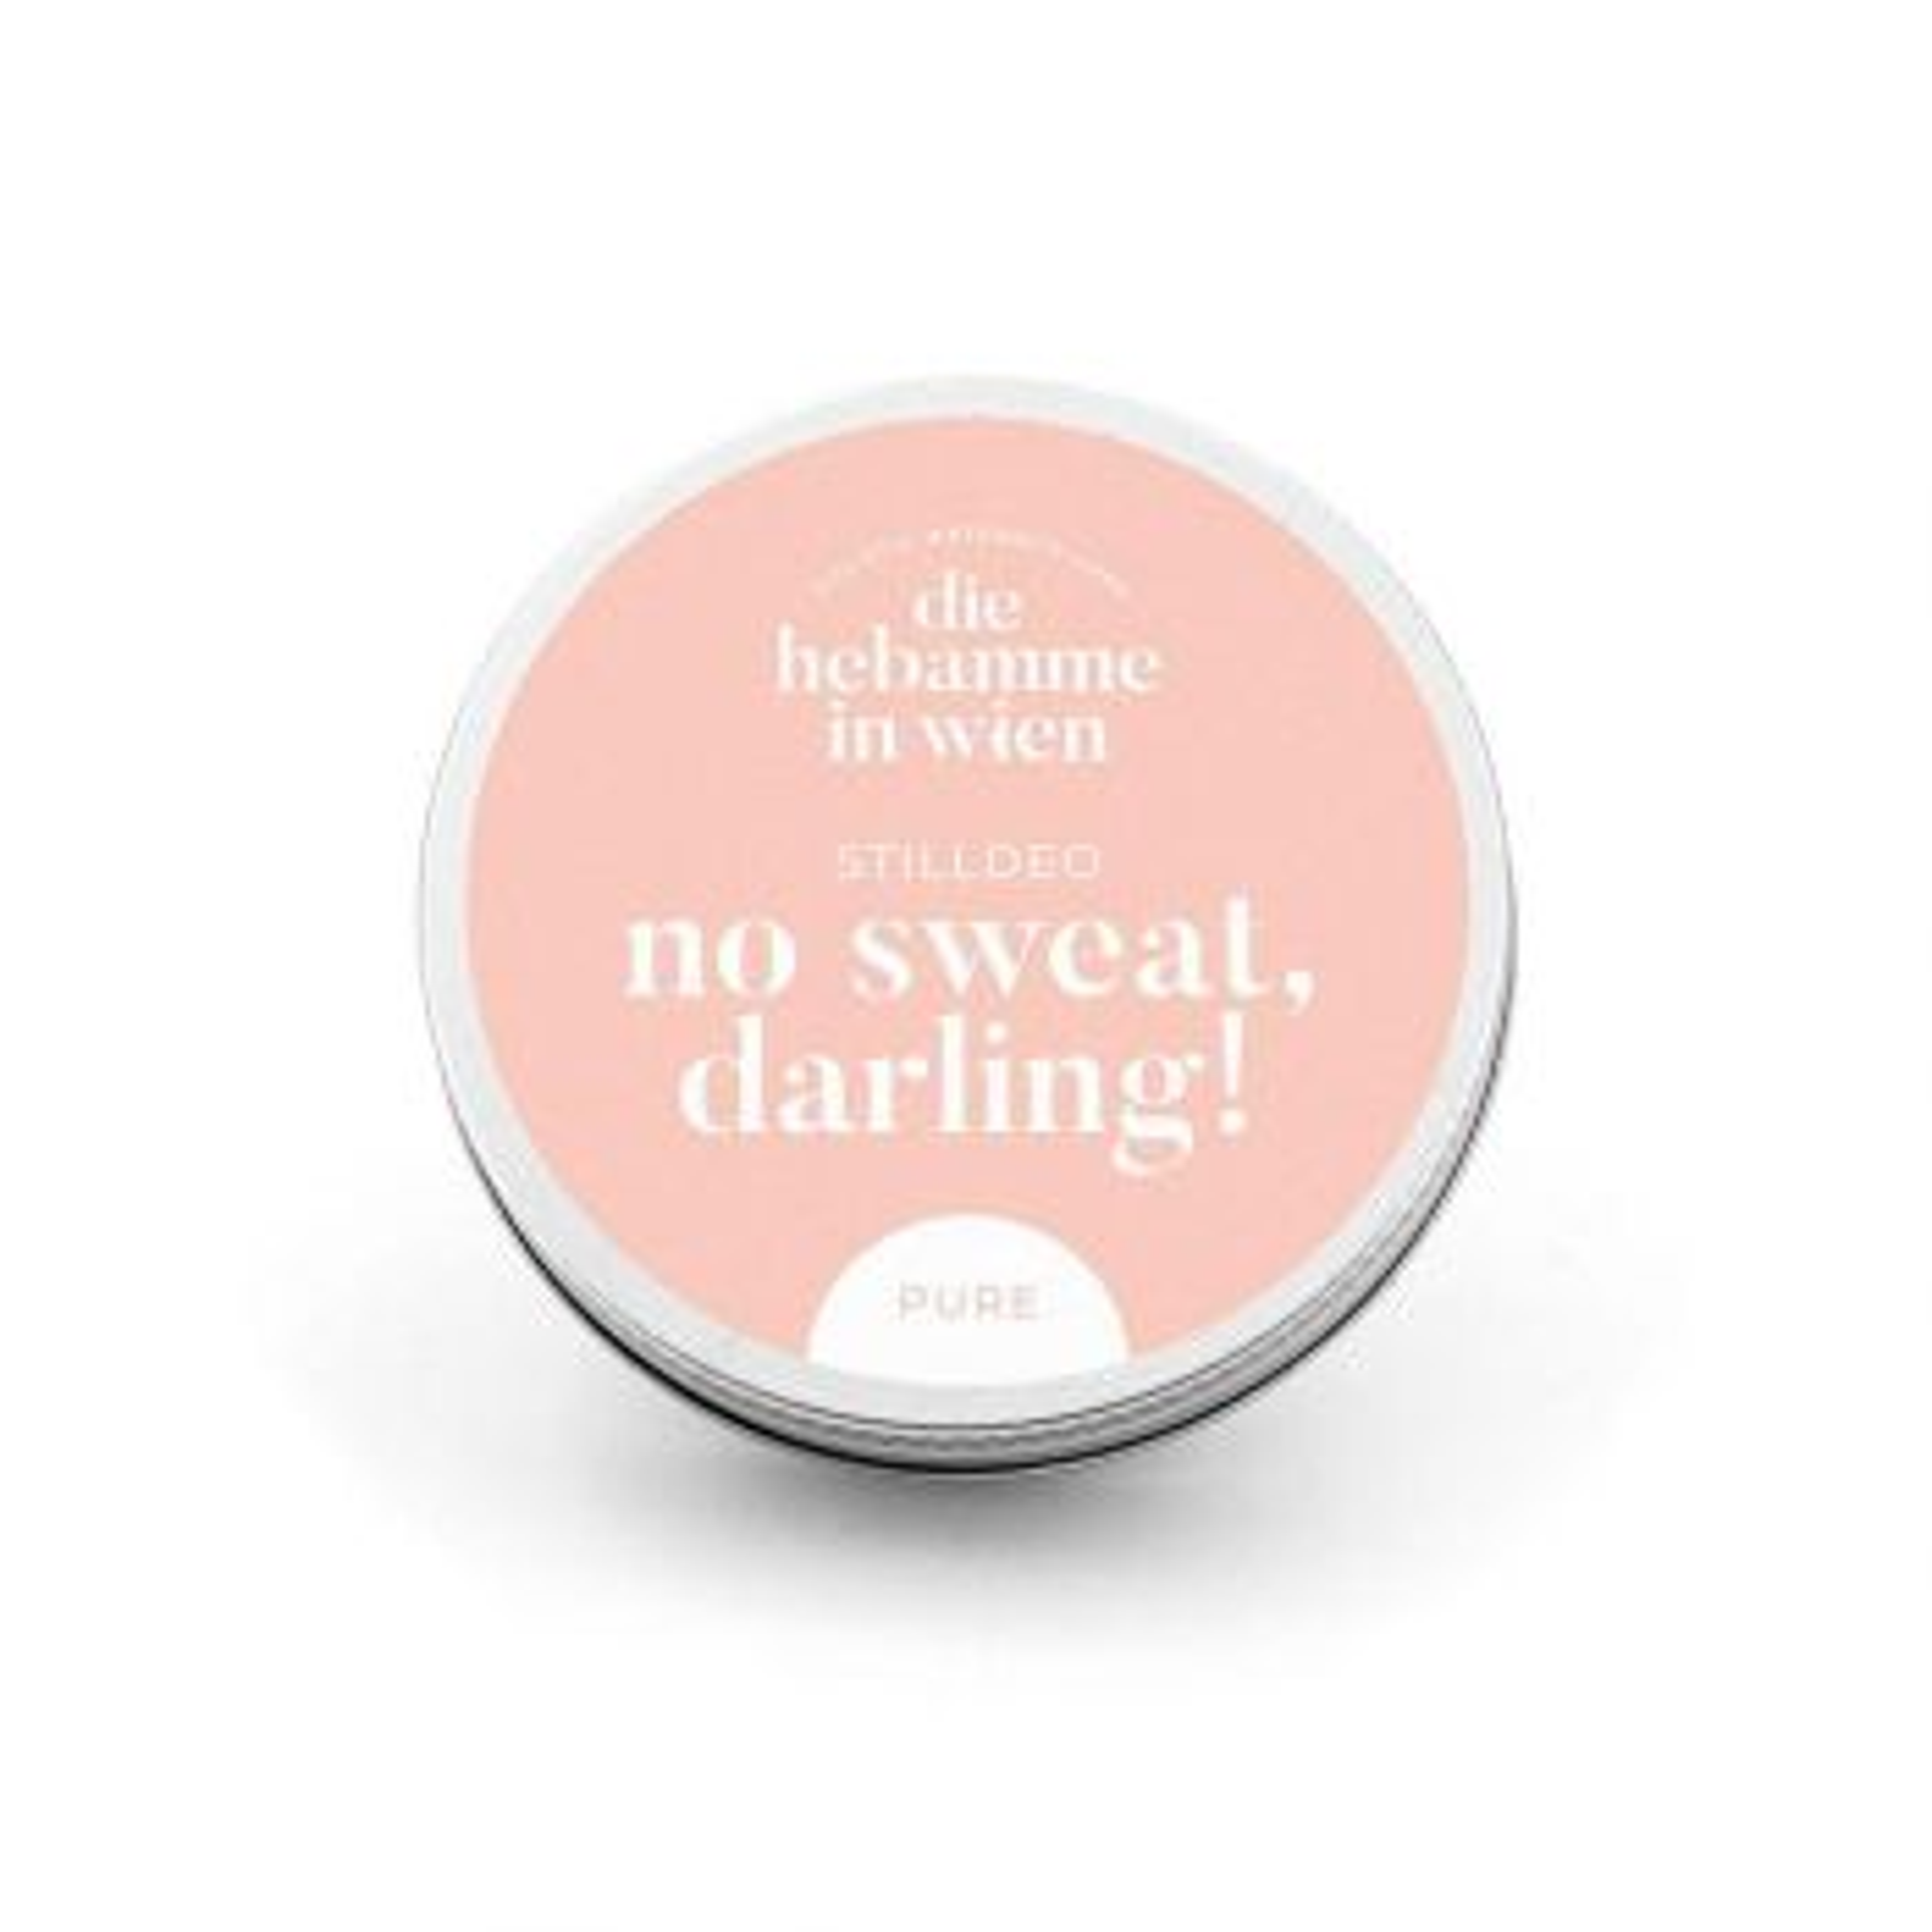 Deo no sweat darling Pure